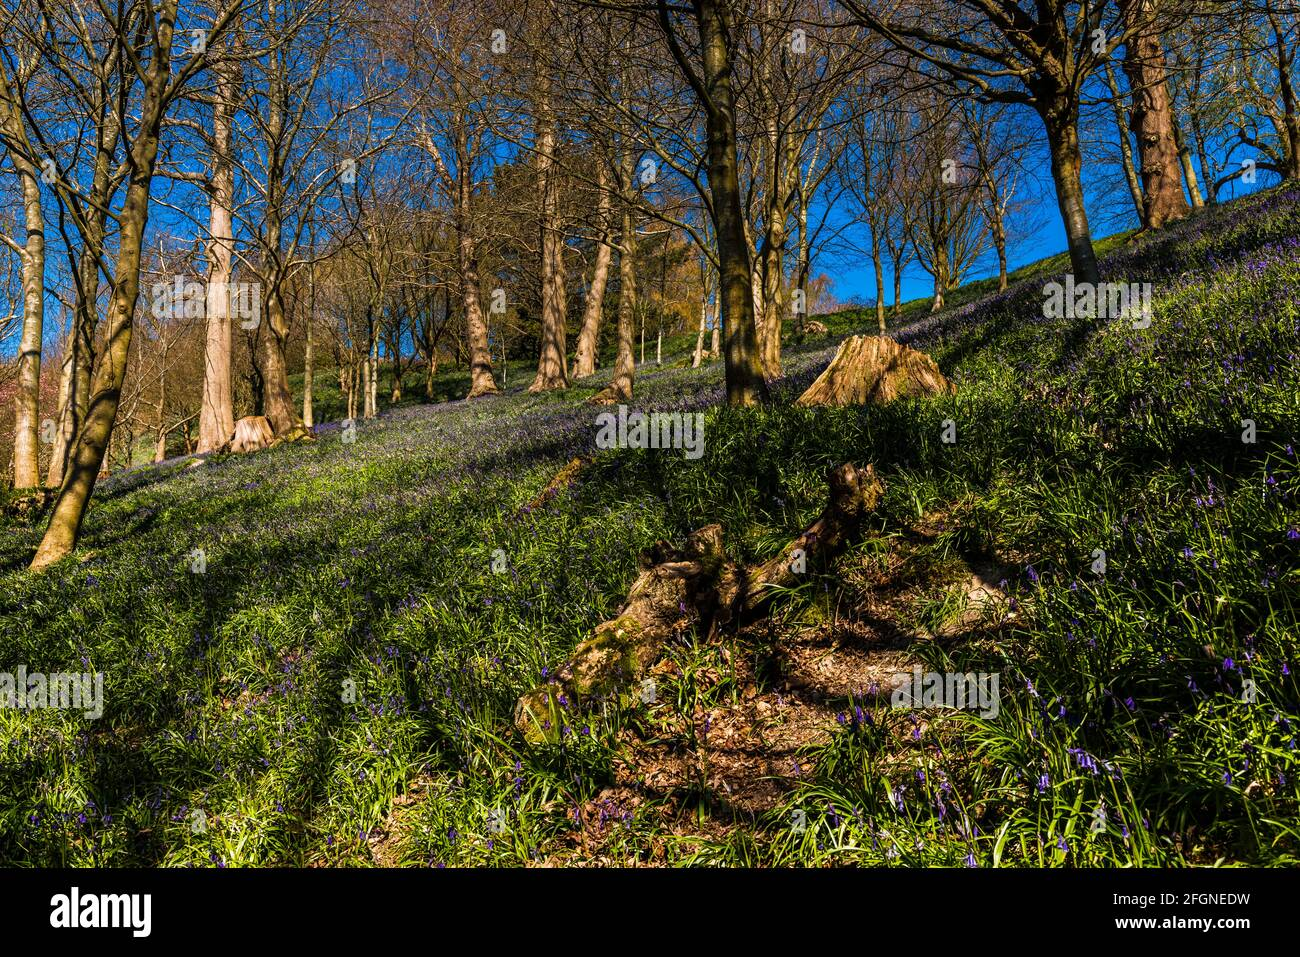 Alfombra de bluebell en madera en primavera, Emmetts Garden, Kent, Reino Unido Foto de stock